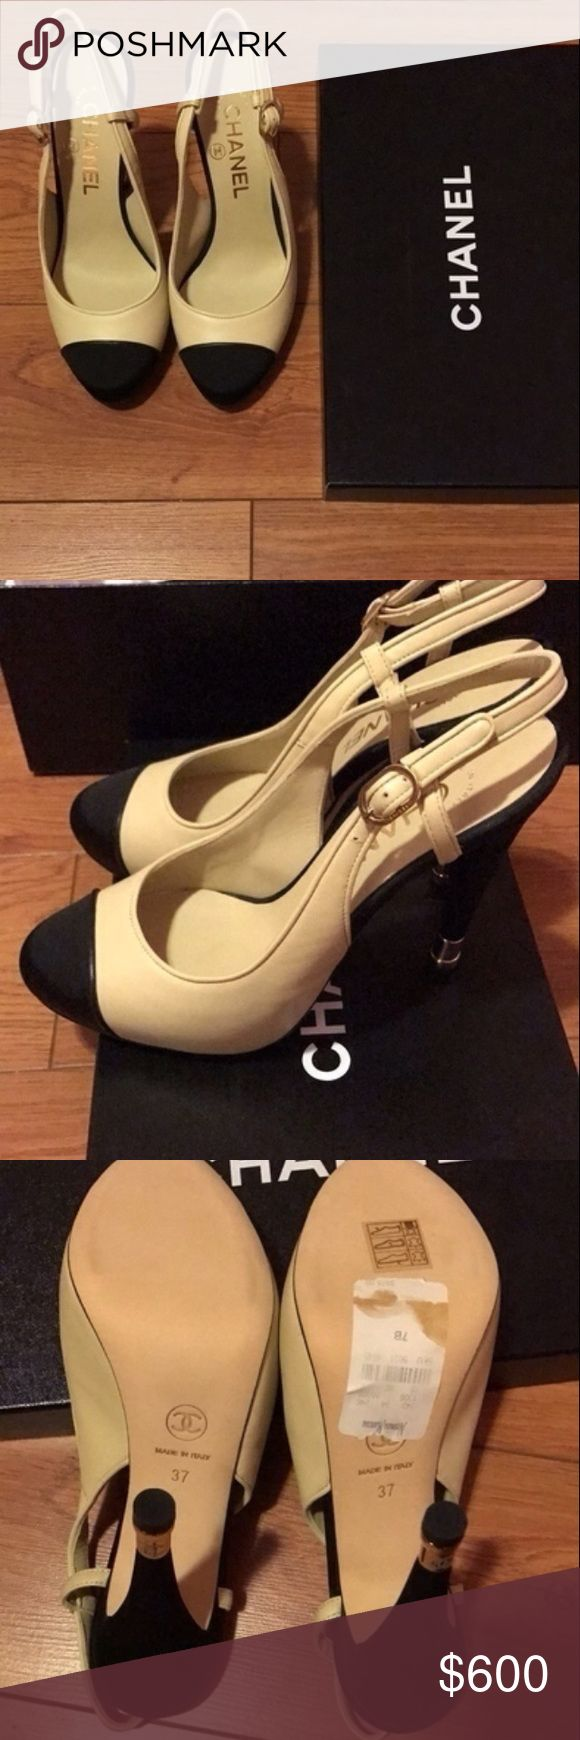 Chanel heels Chanel two tone heels CHANEL Shoes Heels